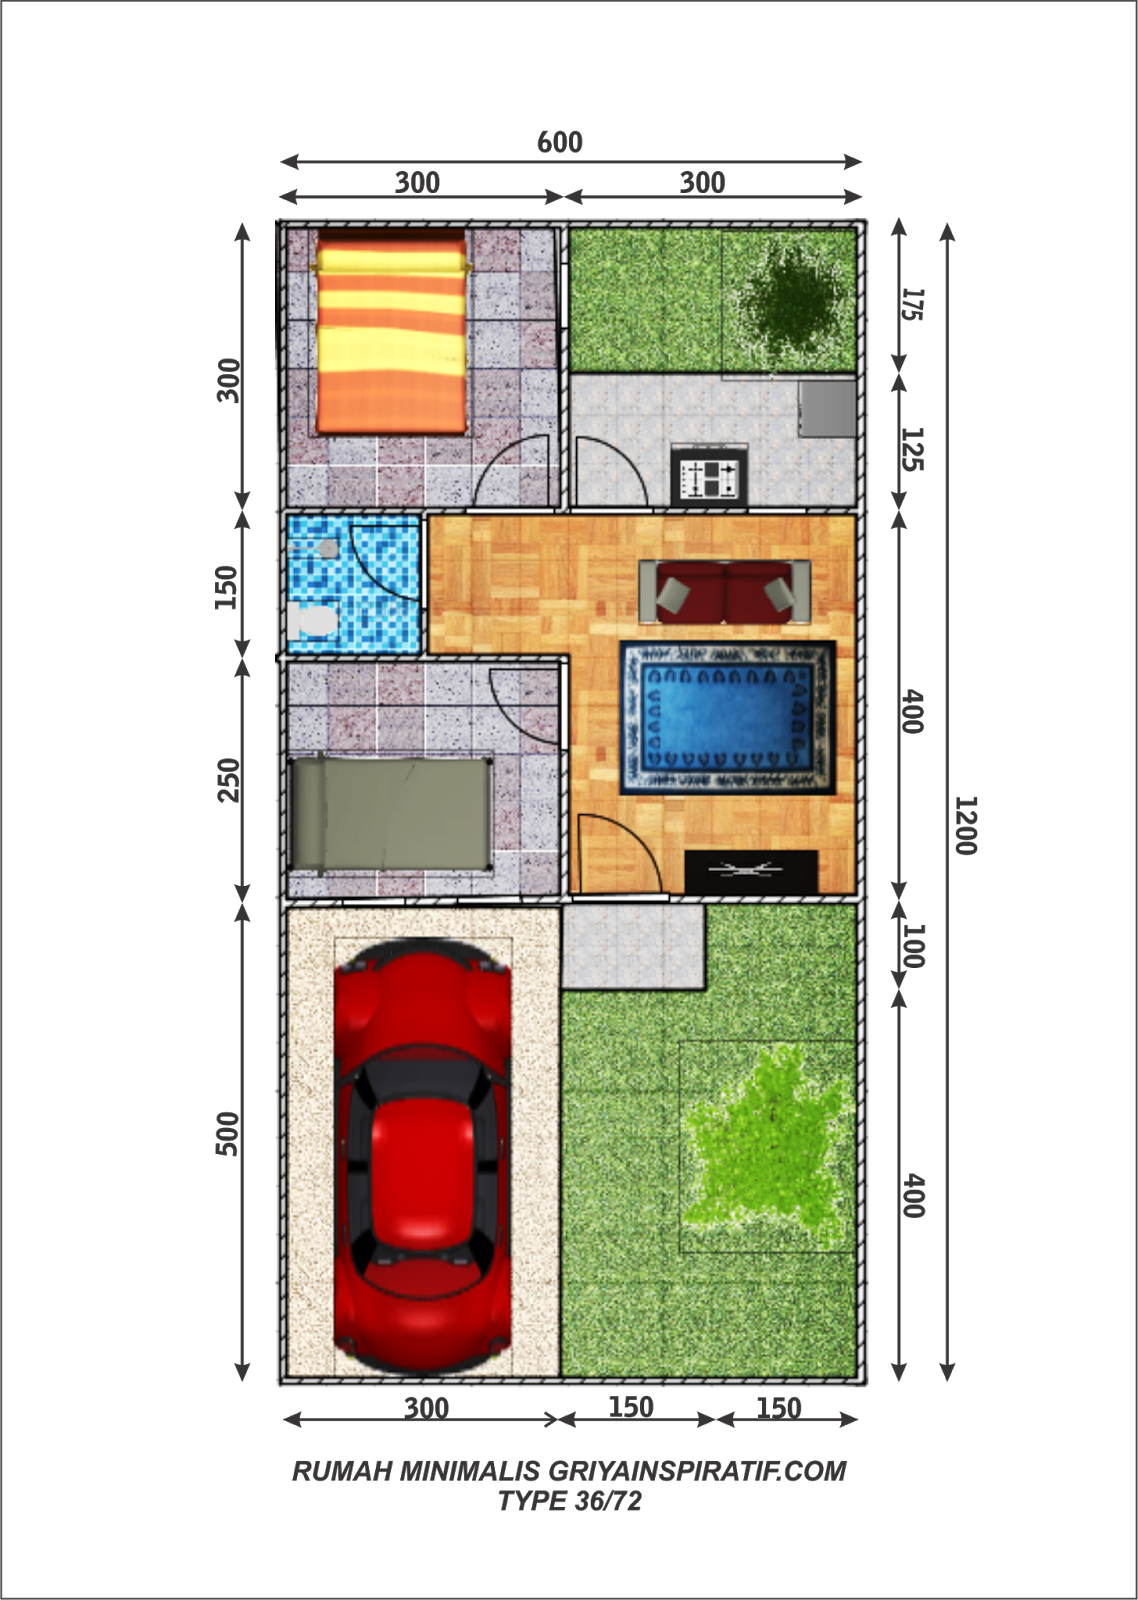 Denah Rumah Minimalis Type 36 72 Griya Inspiratif